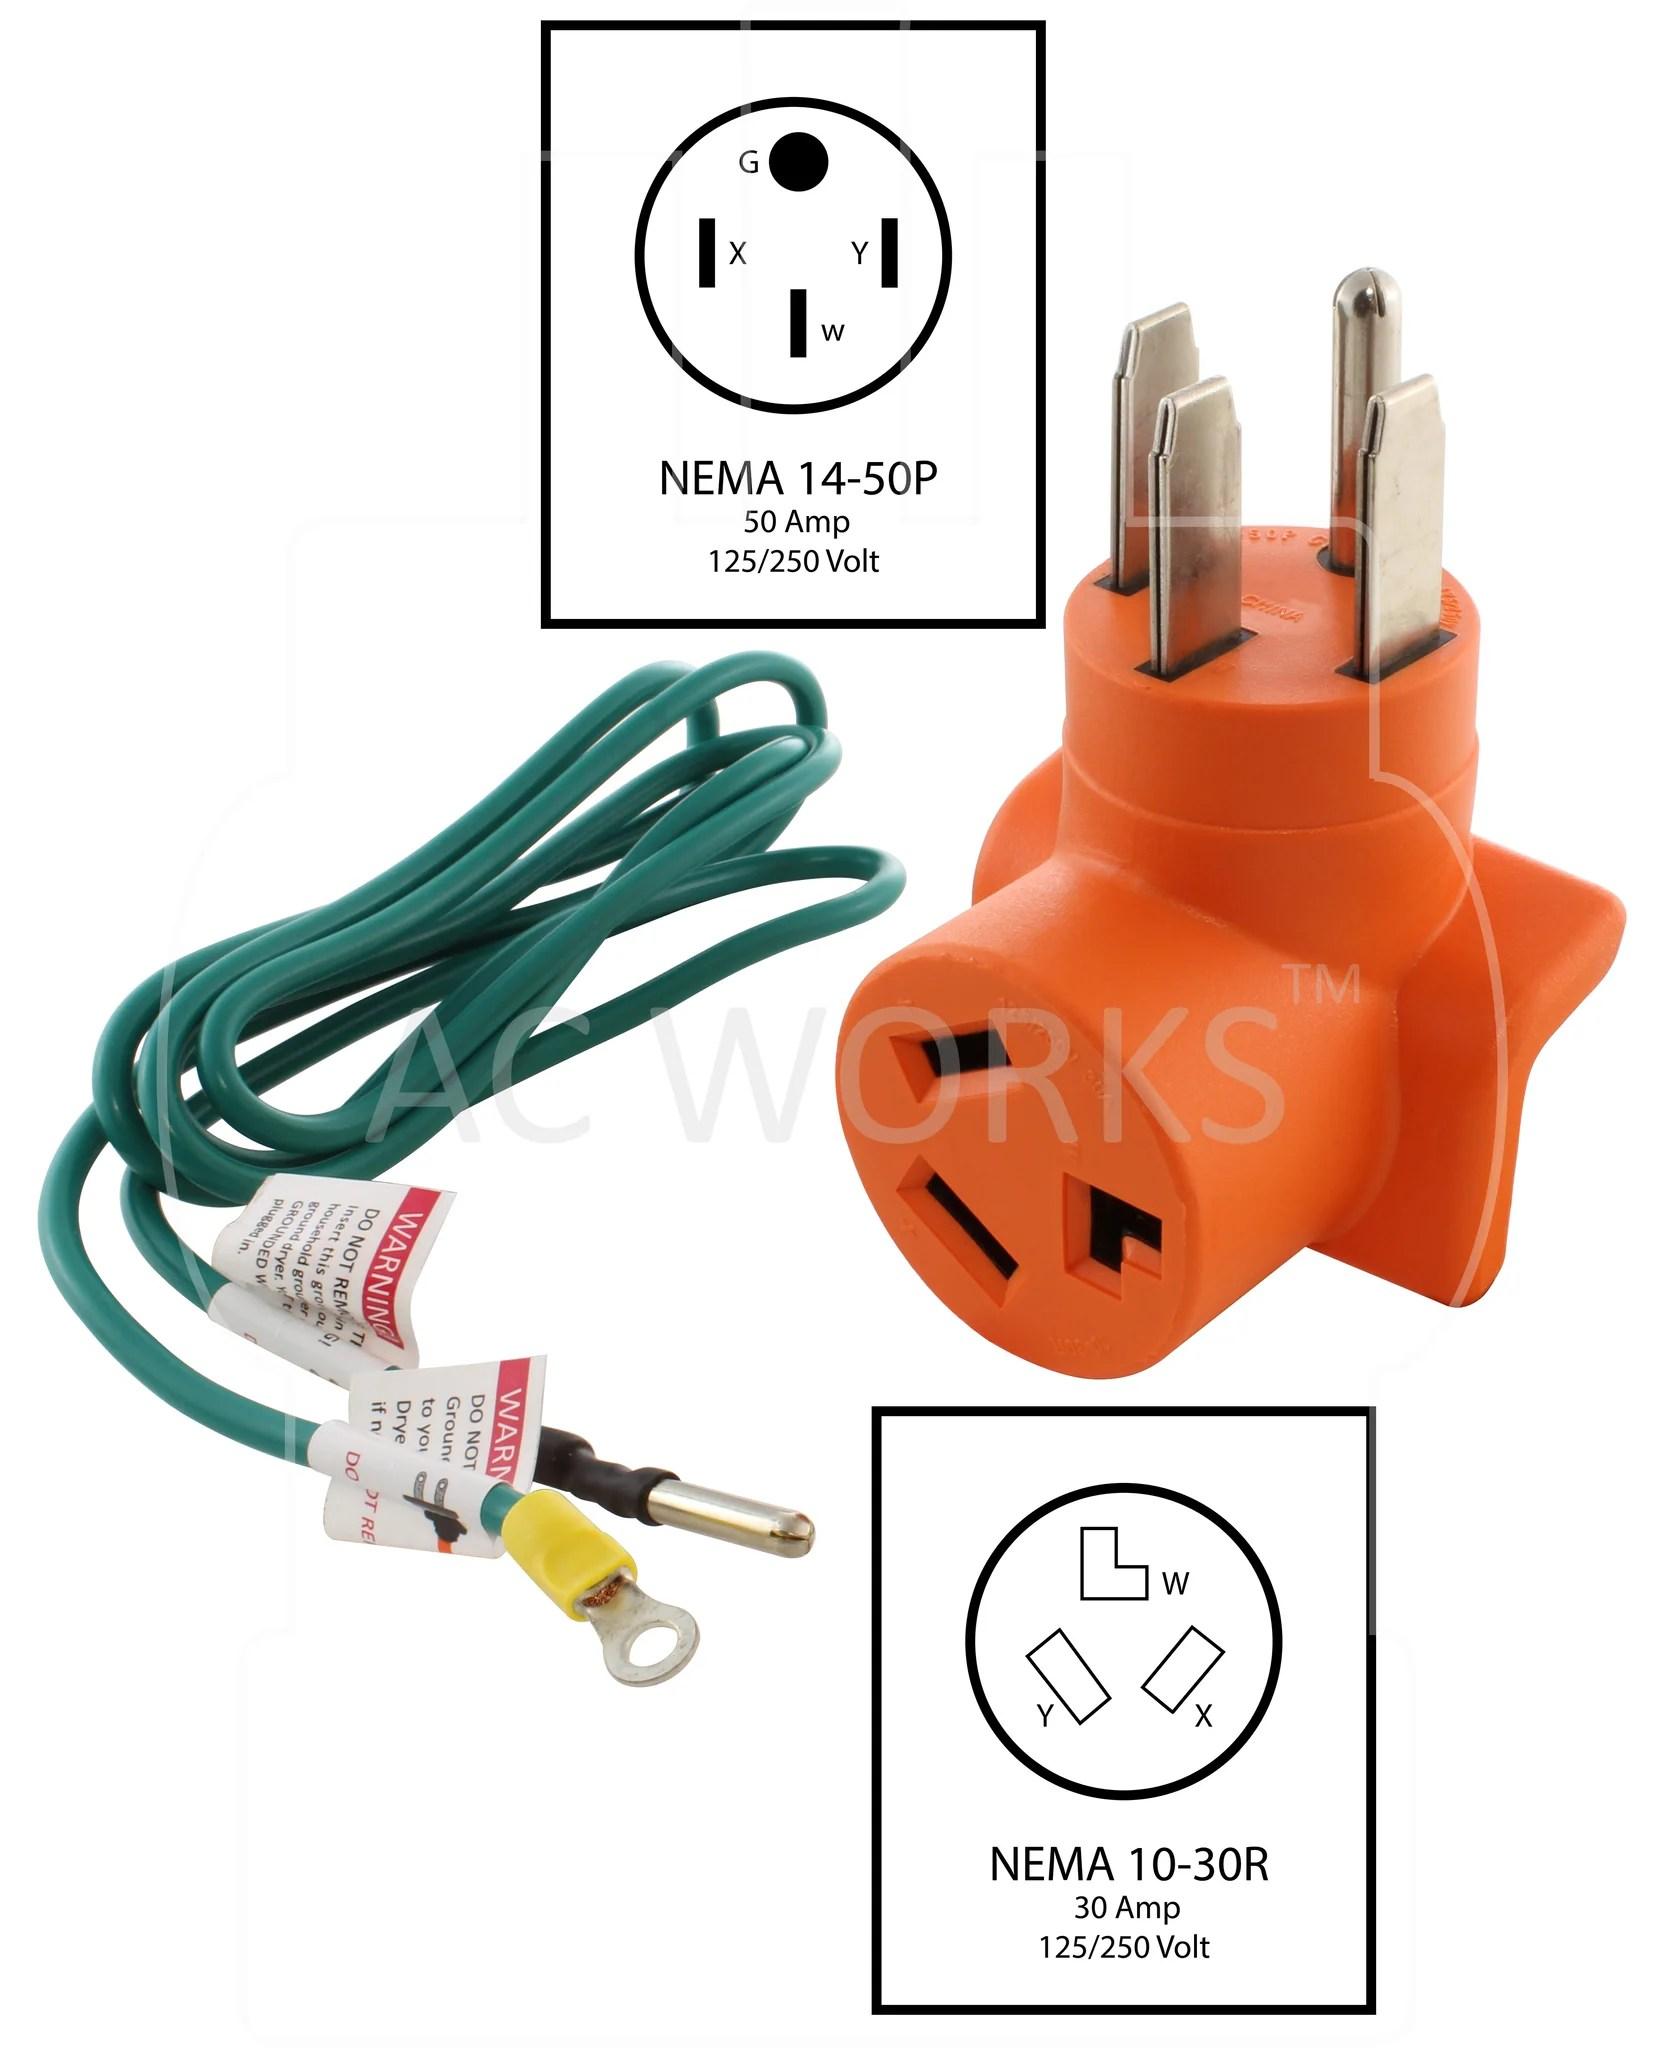 medium resolution of  nema 14 50p to nema 10 30r 1450 to 1030 range outlet